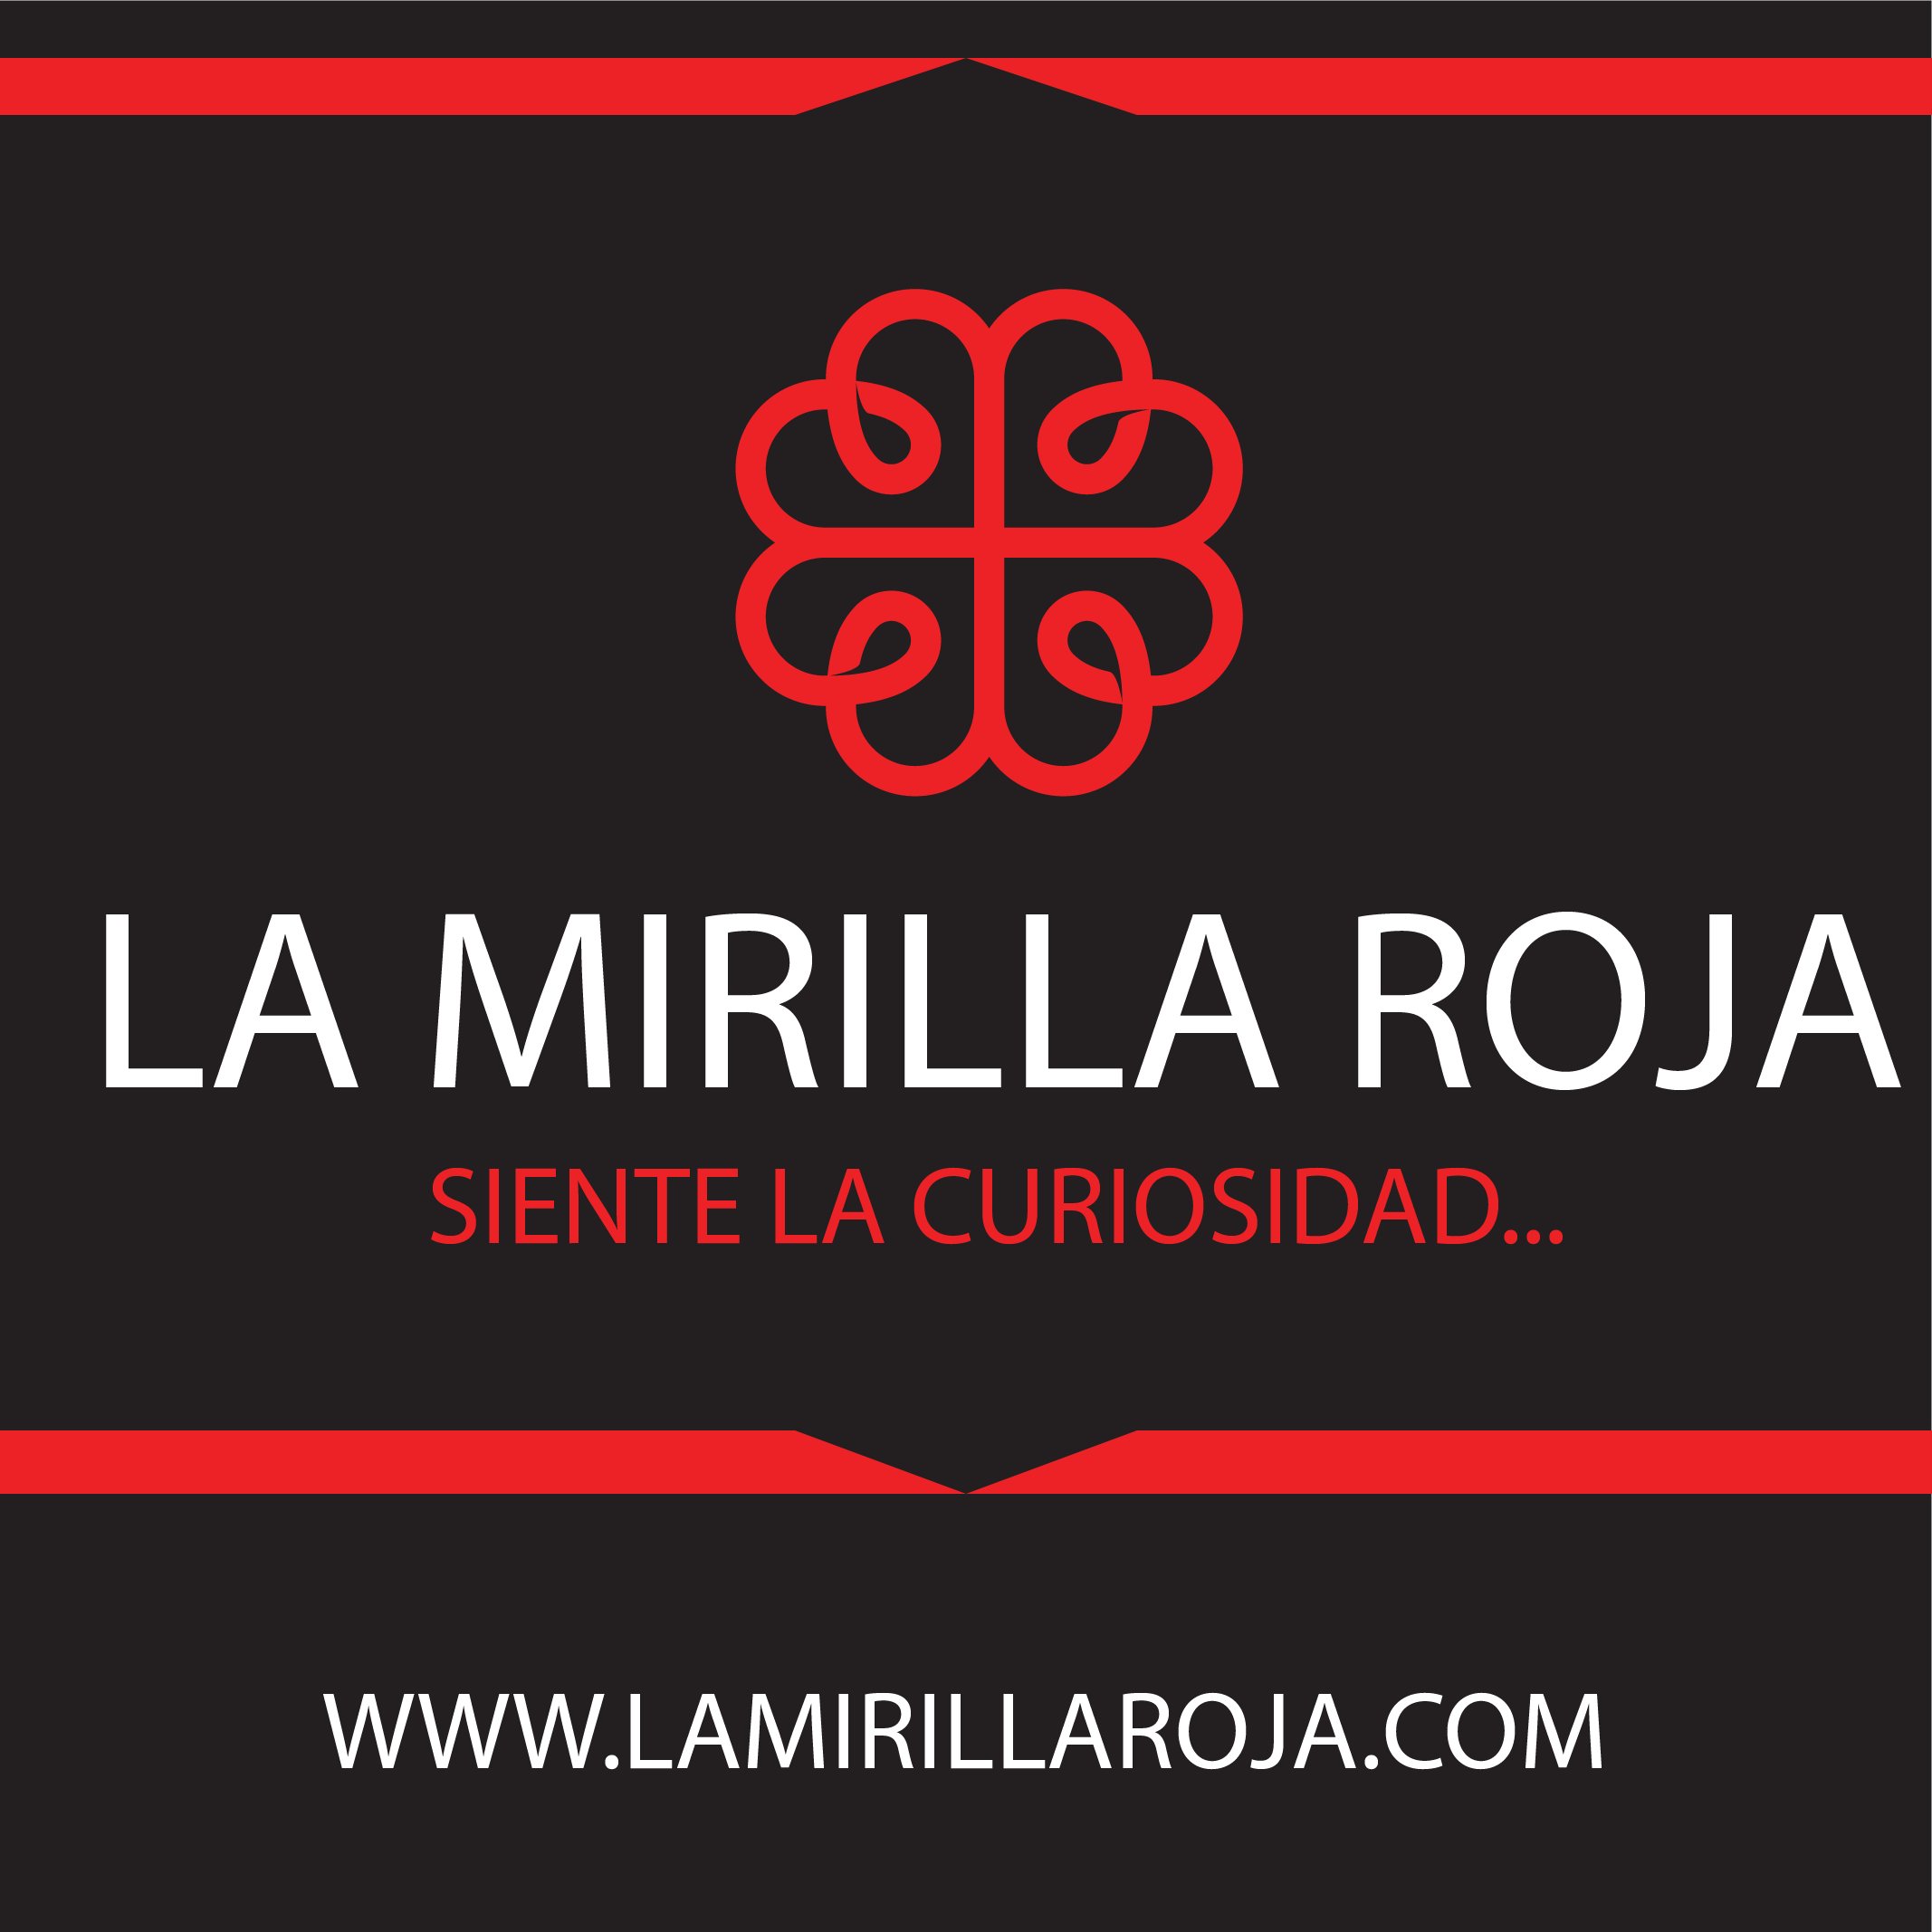 La Mirilla Roja Stickers messages sticker-0